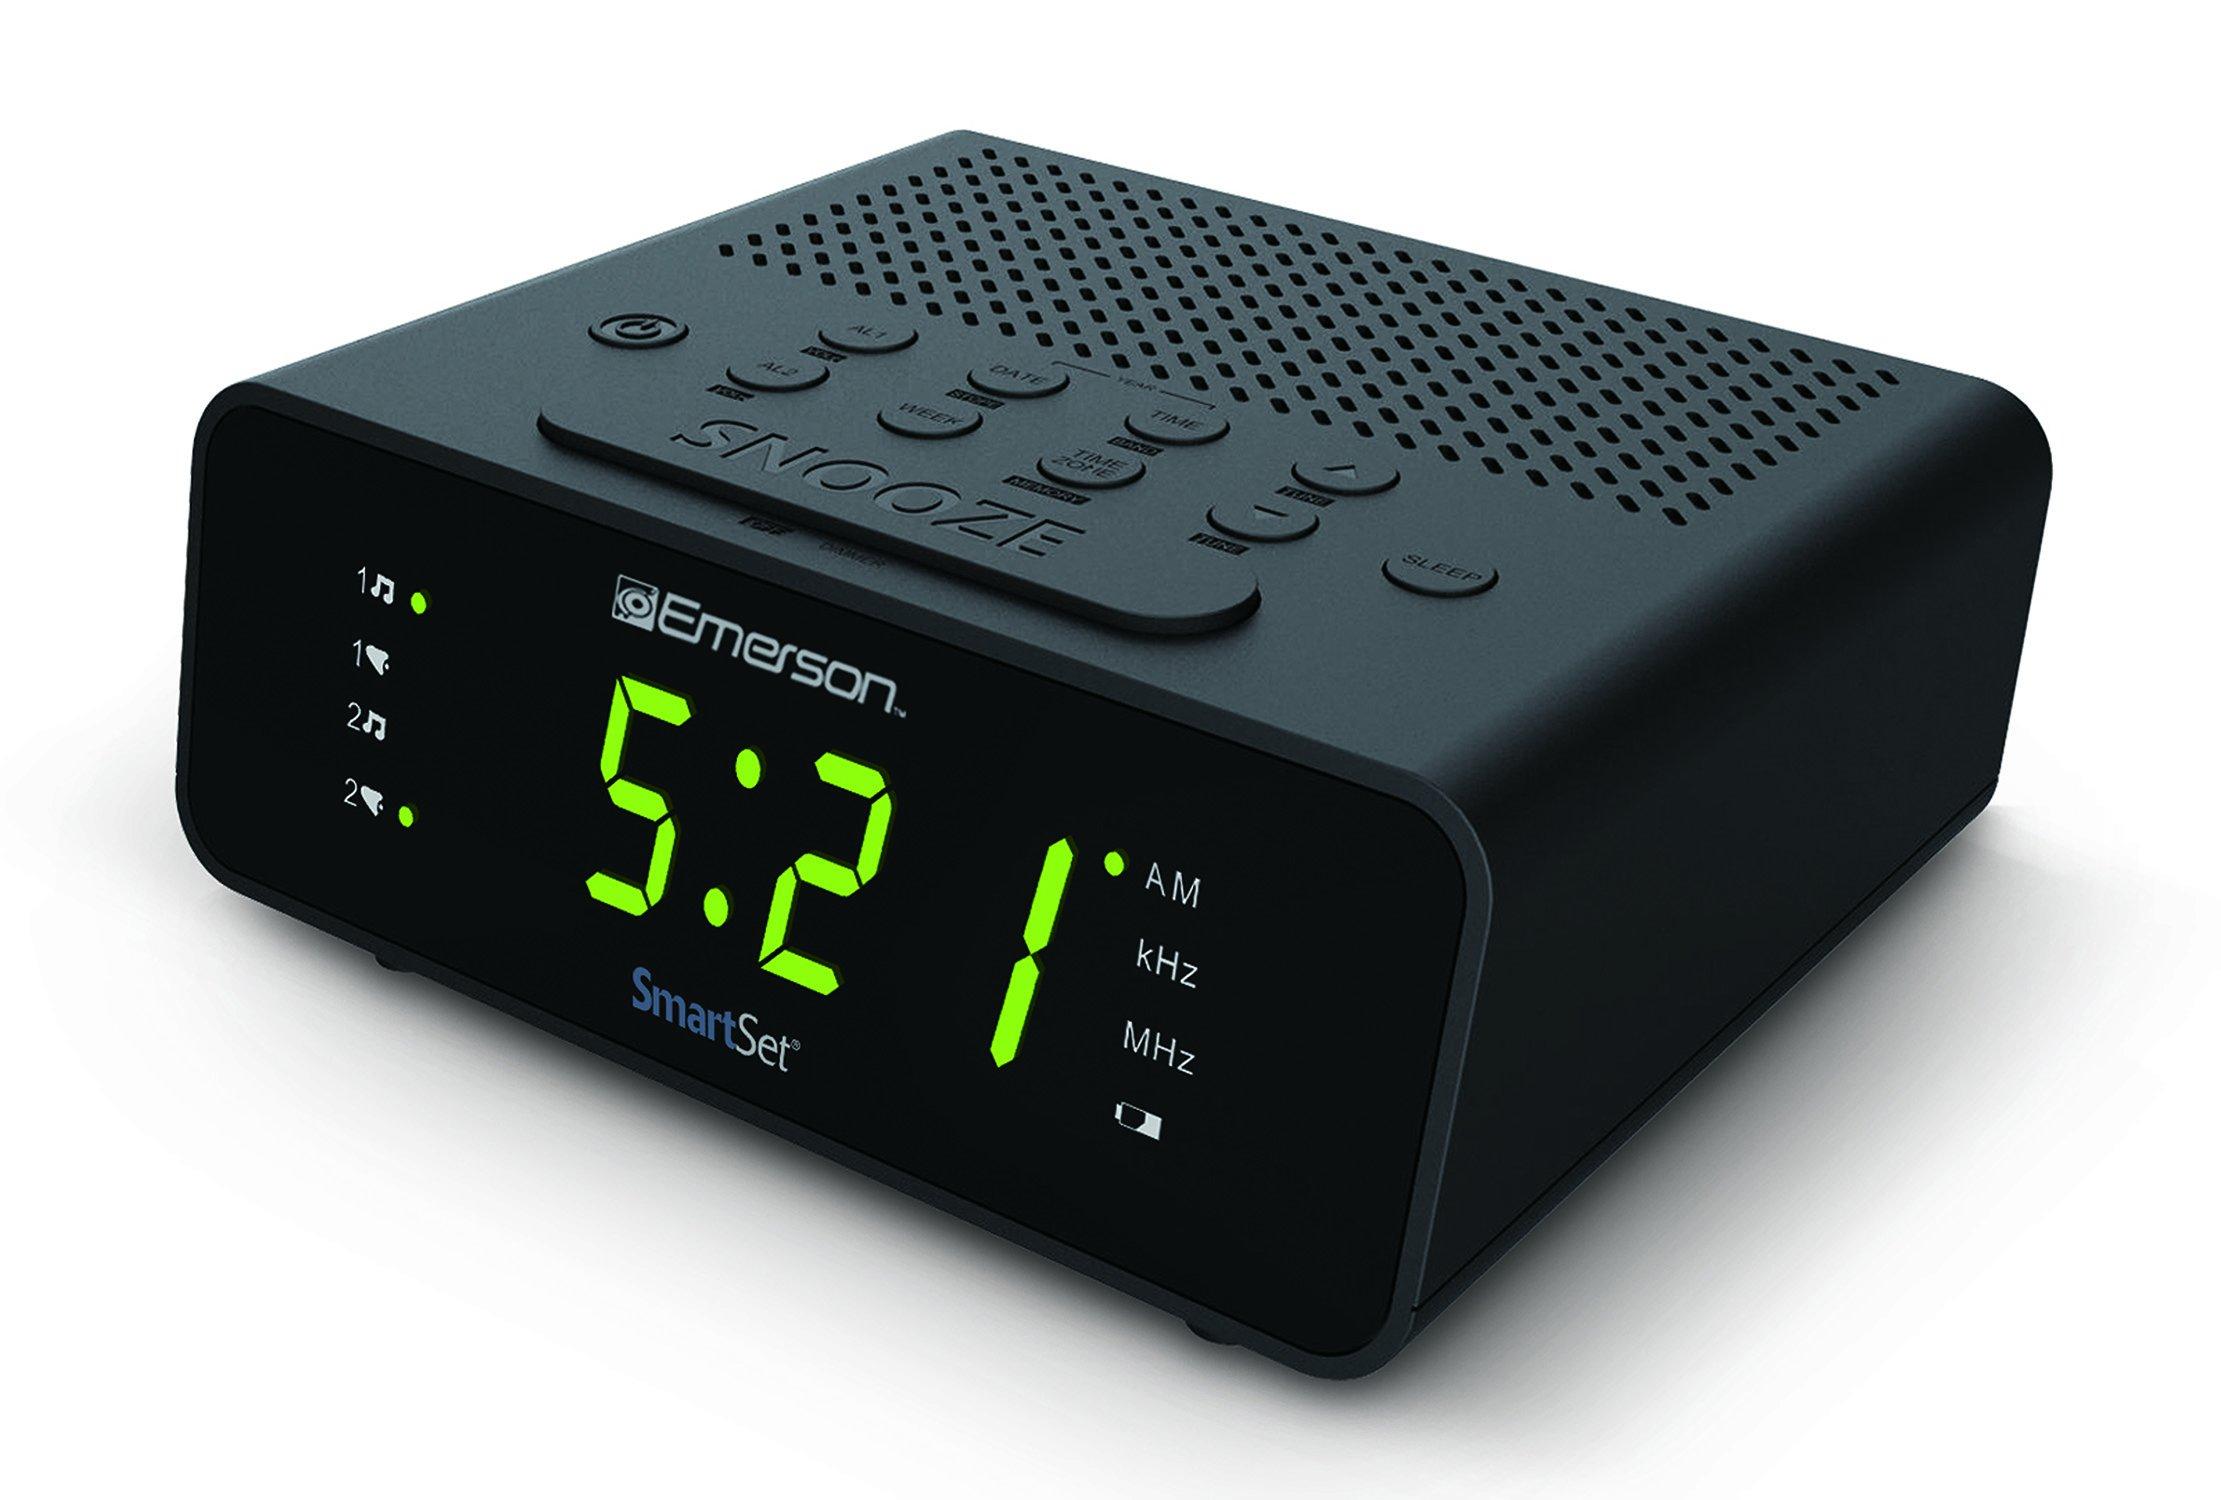 Amazon.com: Sylvania AM/FM Clock Radio With Dual Alarm ...